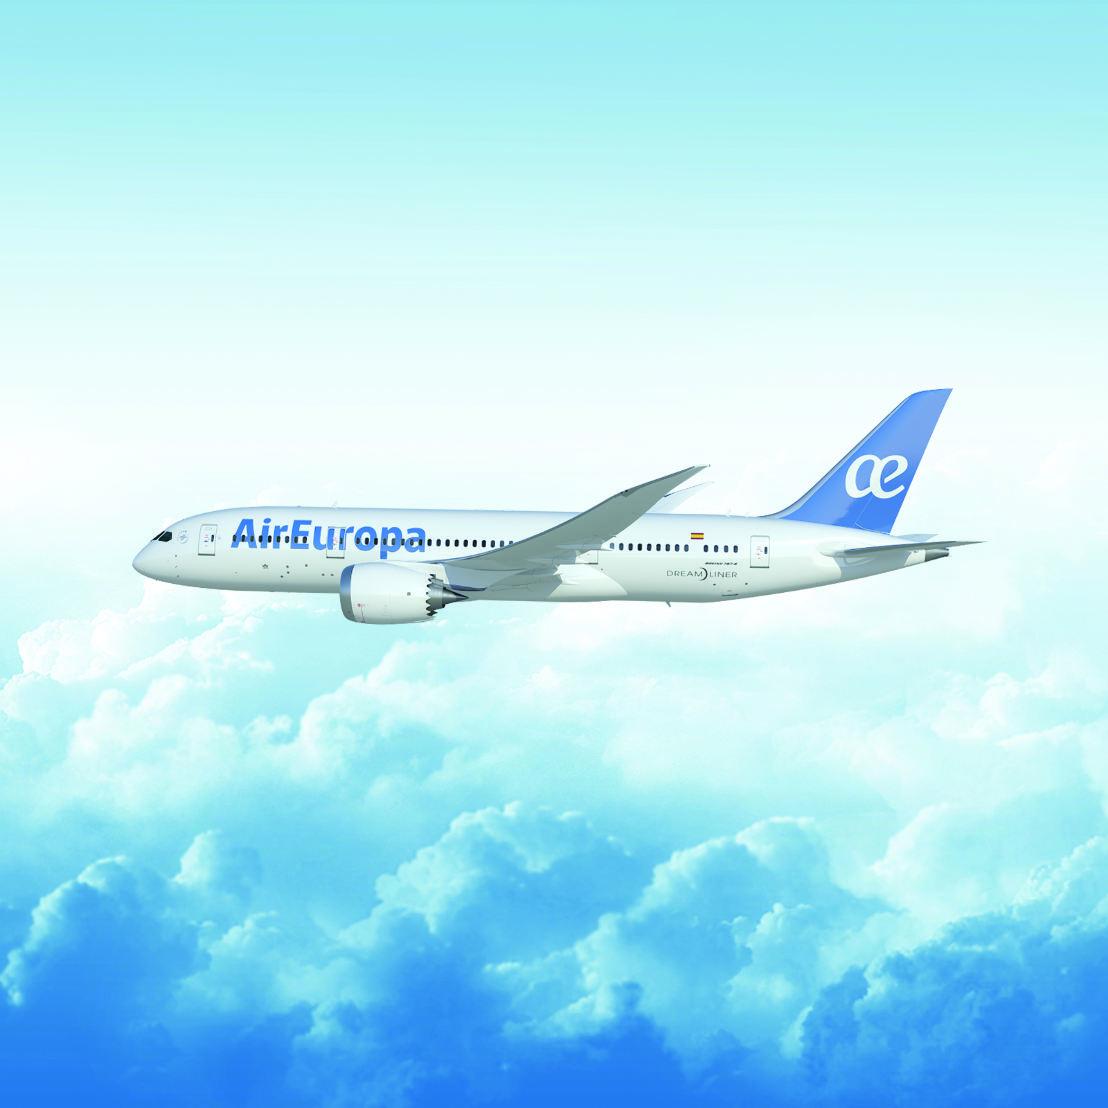 Air Europa positionne son sixième Boeing 787 Dreamliner vers Cuba